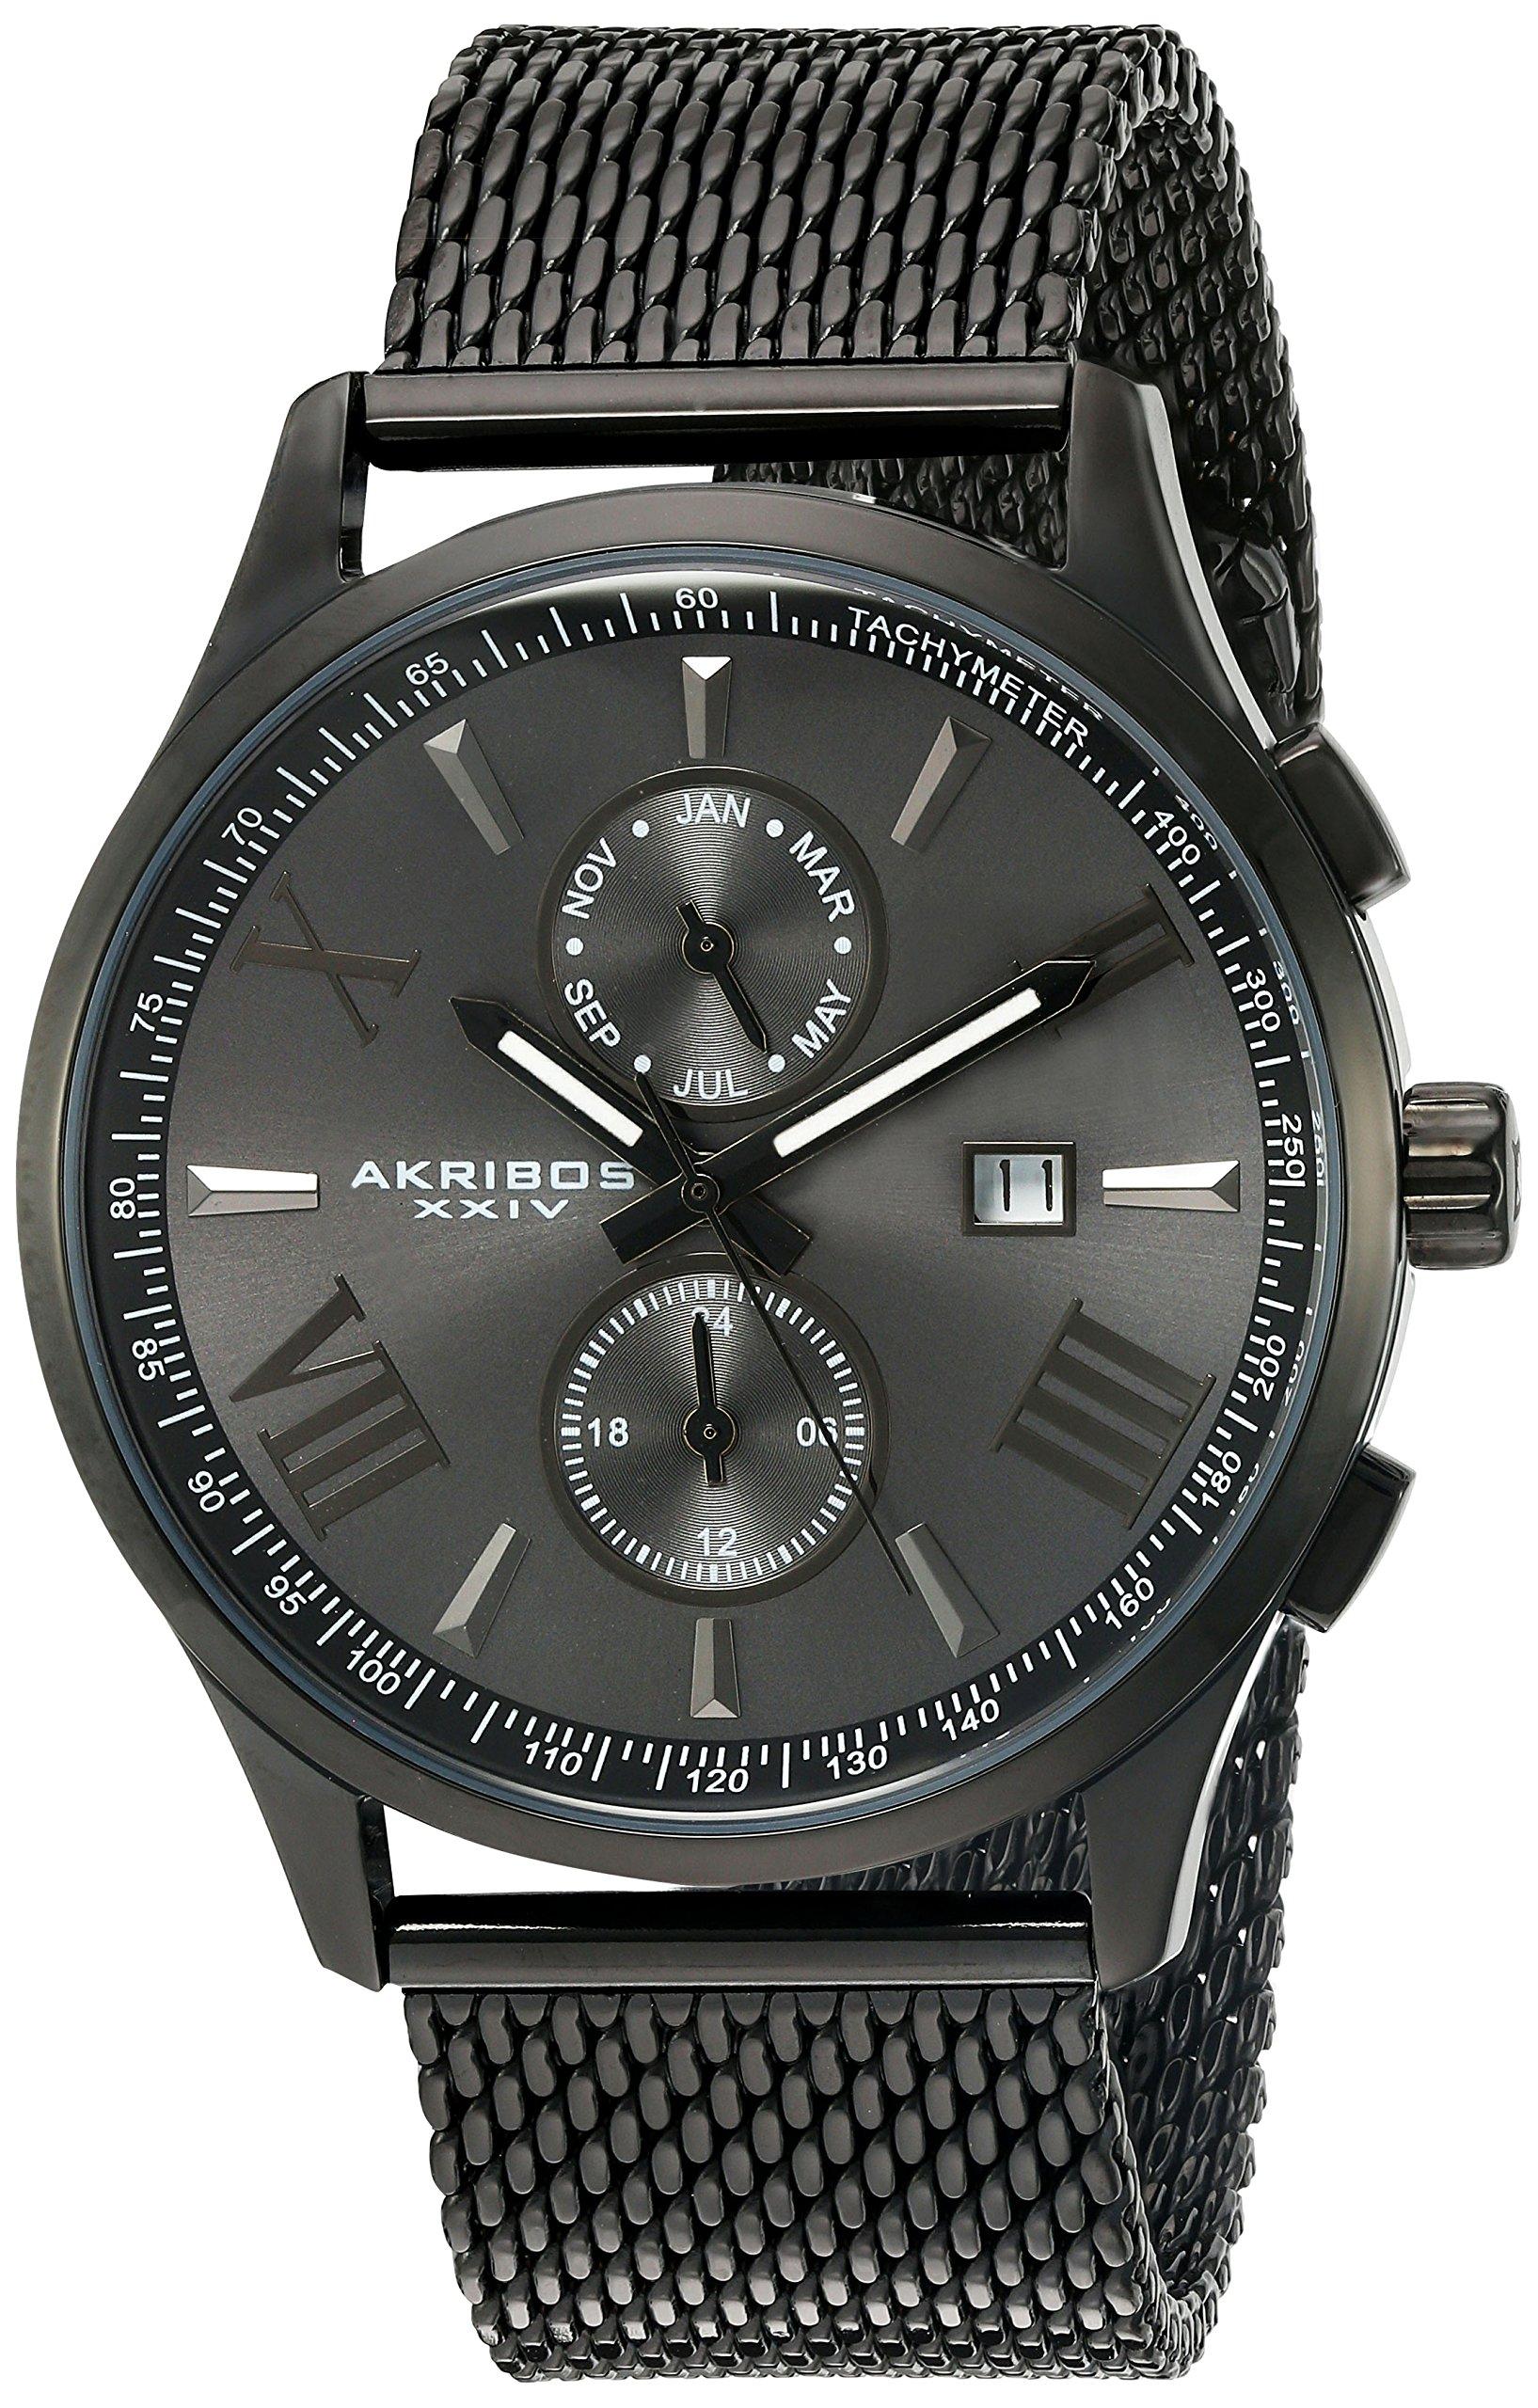 Akribos-XXIV-Herren-Armbanduhr-Swiss-Quarz-Edelstahl-Kleid